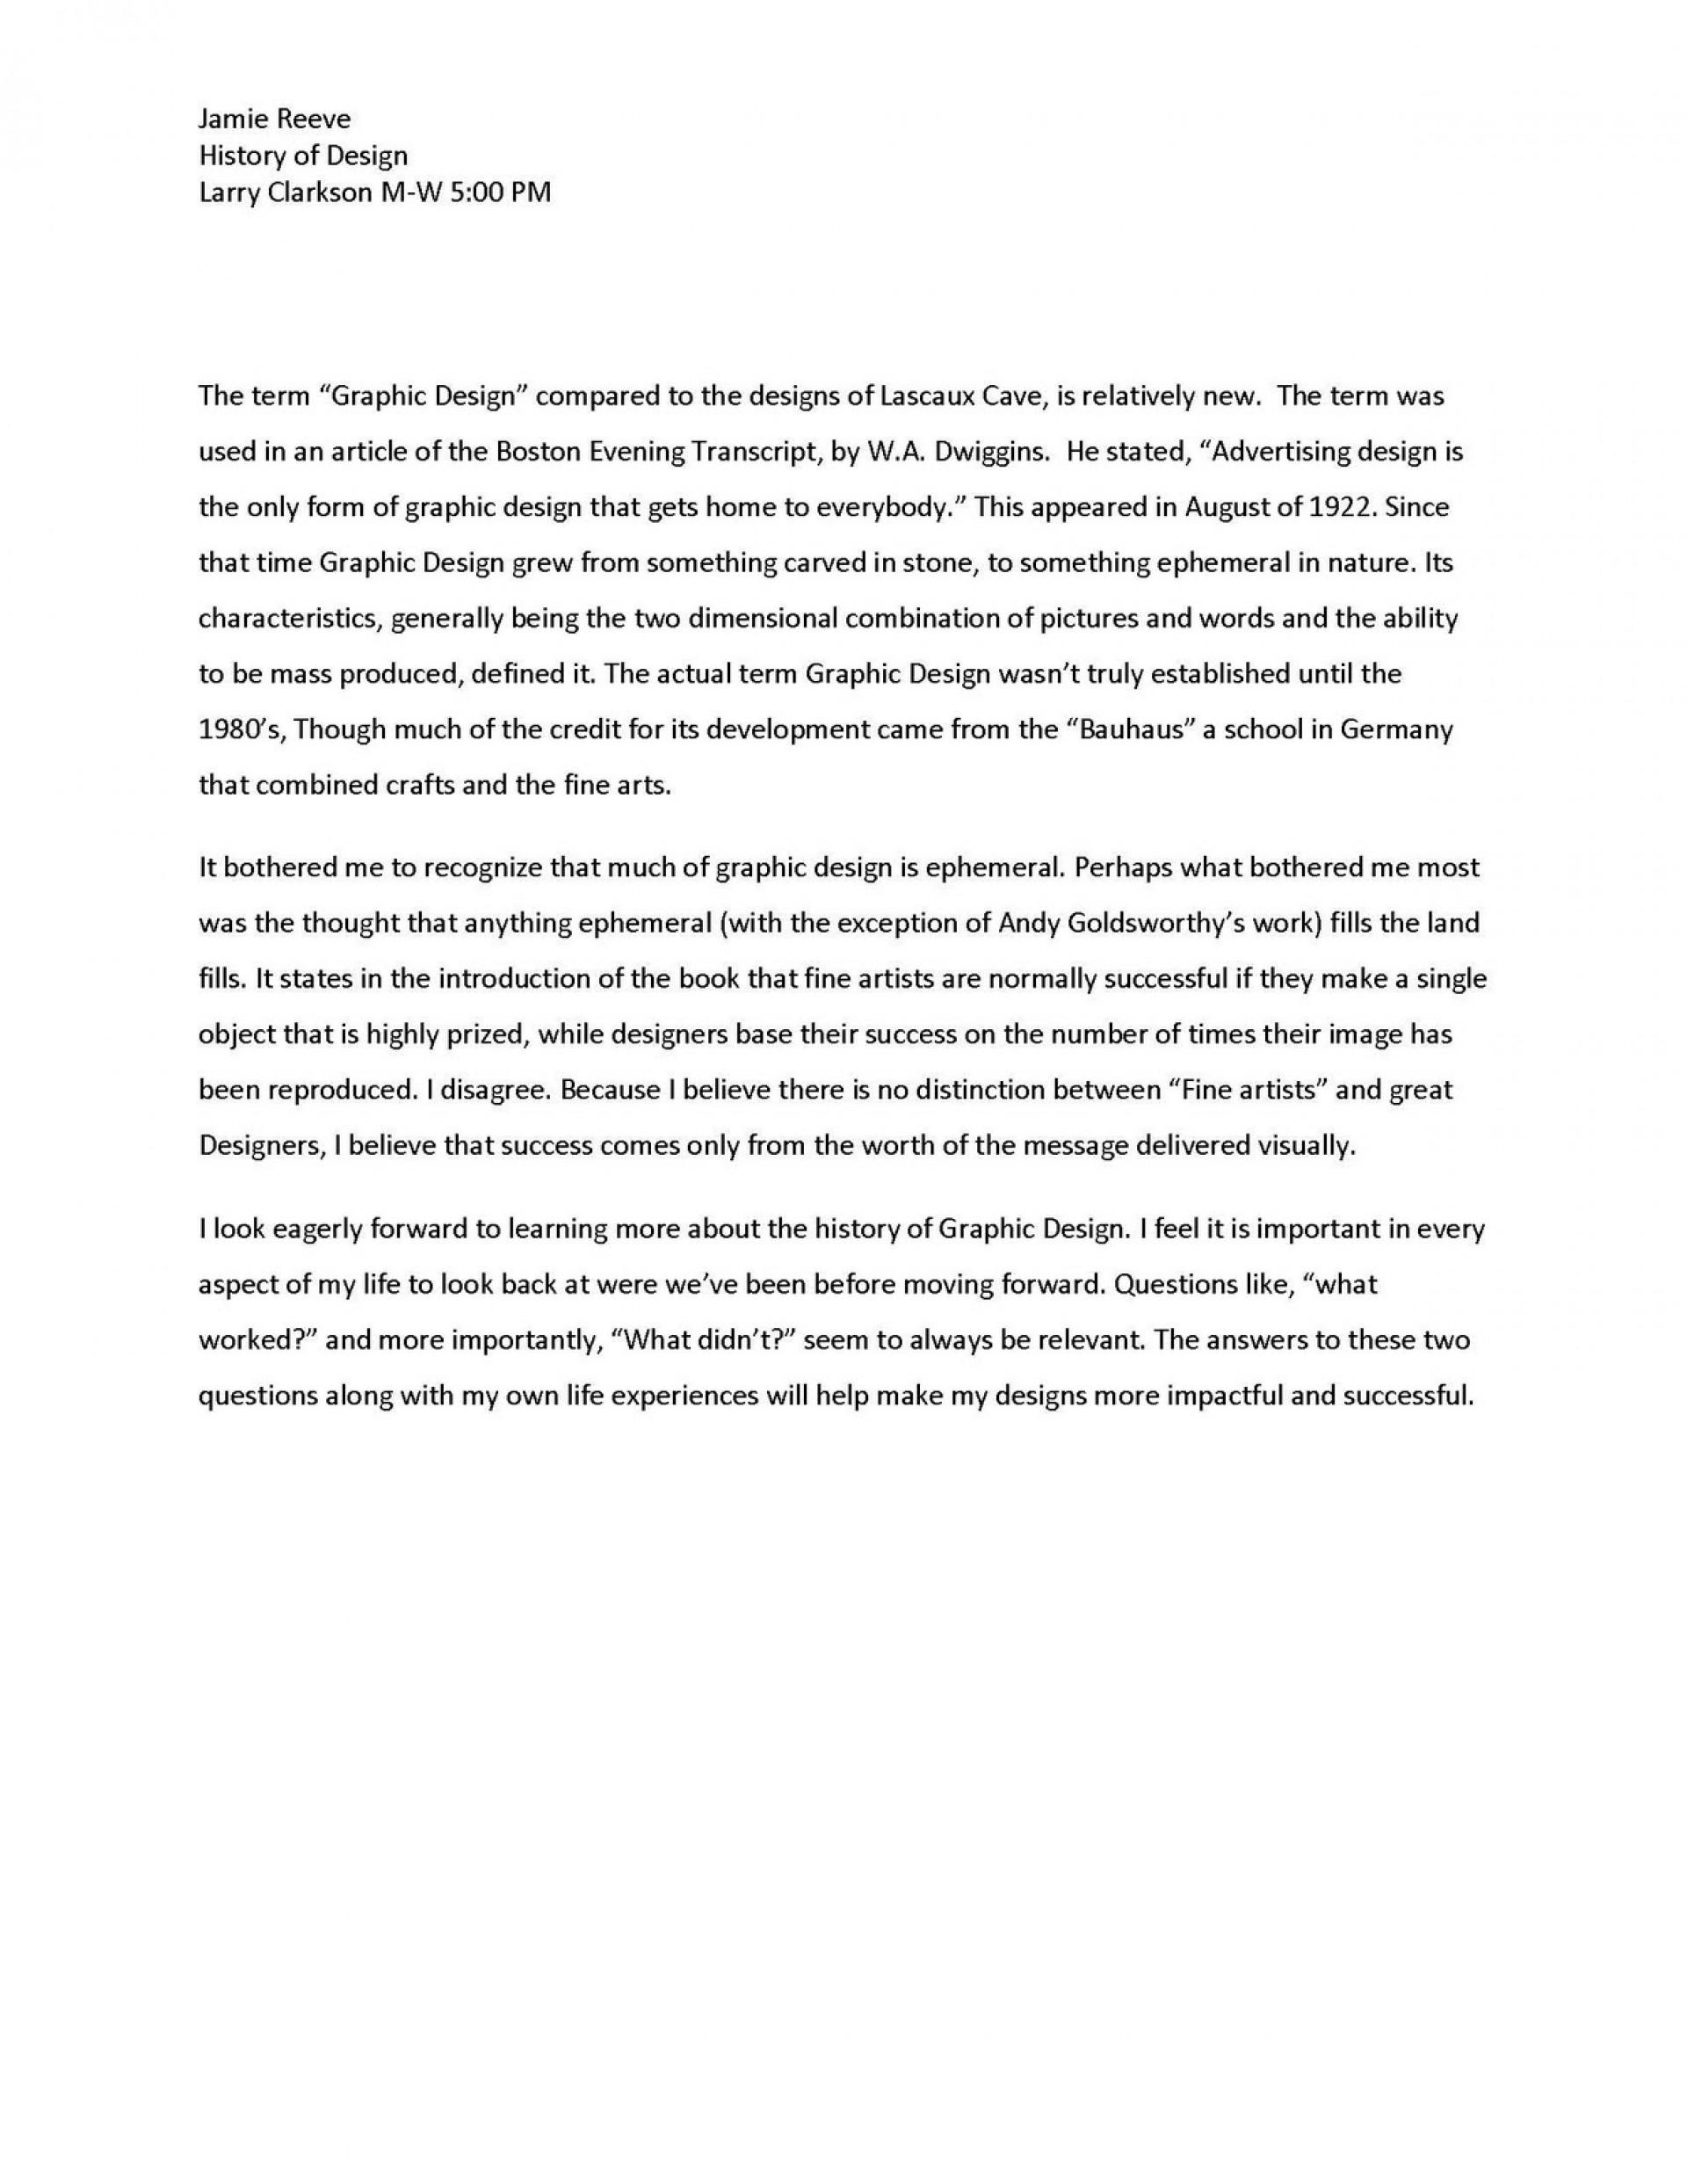 015 Essay1designhistory Page 2 Essay Example This I Believe Impressive Outline 1920